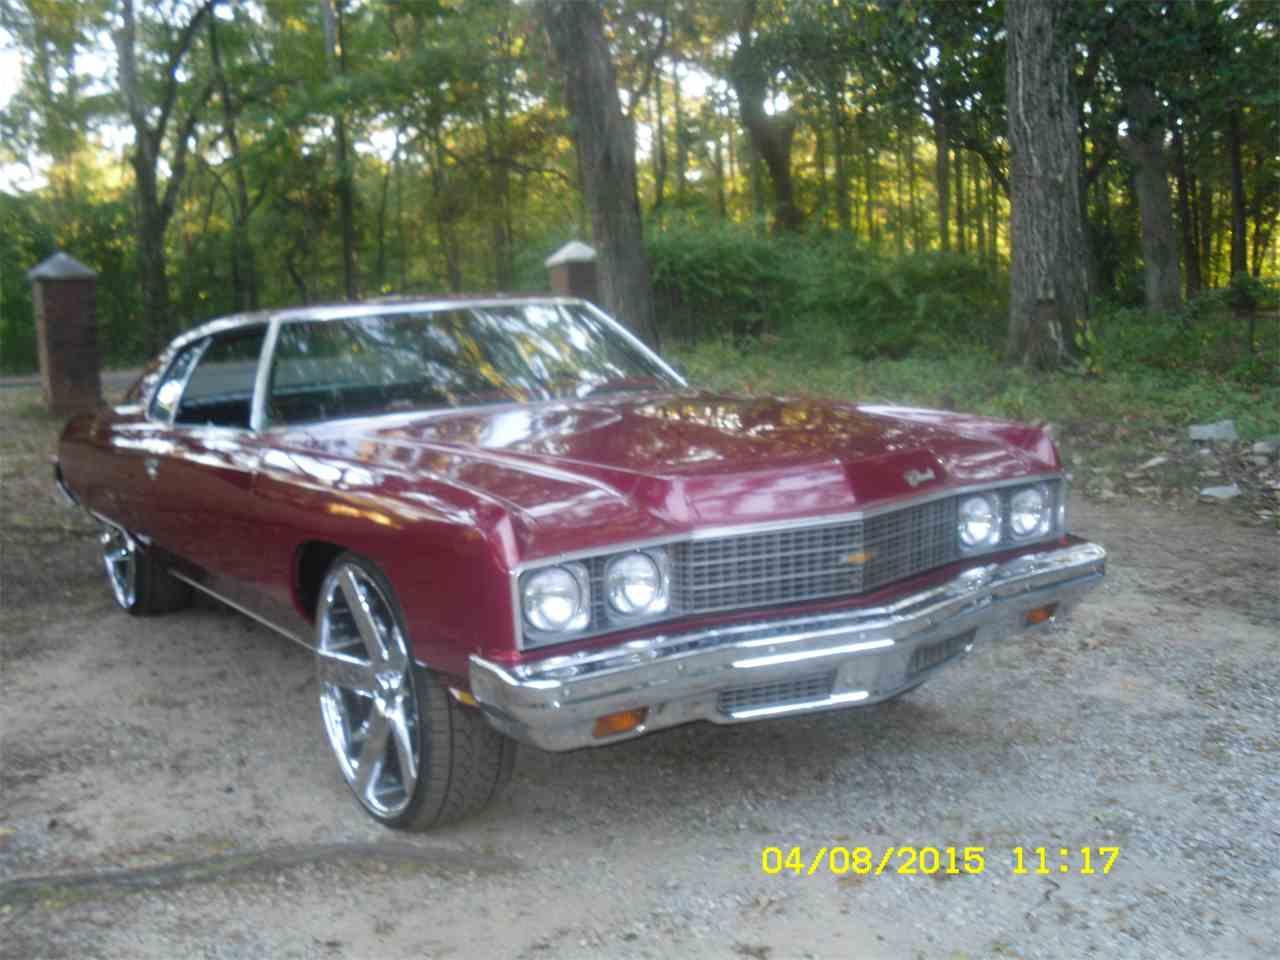 Large Picture of Classic 1973 Chevrolet Impala located in Macon Georgia - $14,500.00 - JIZ7